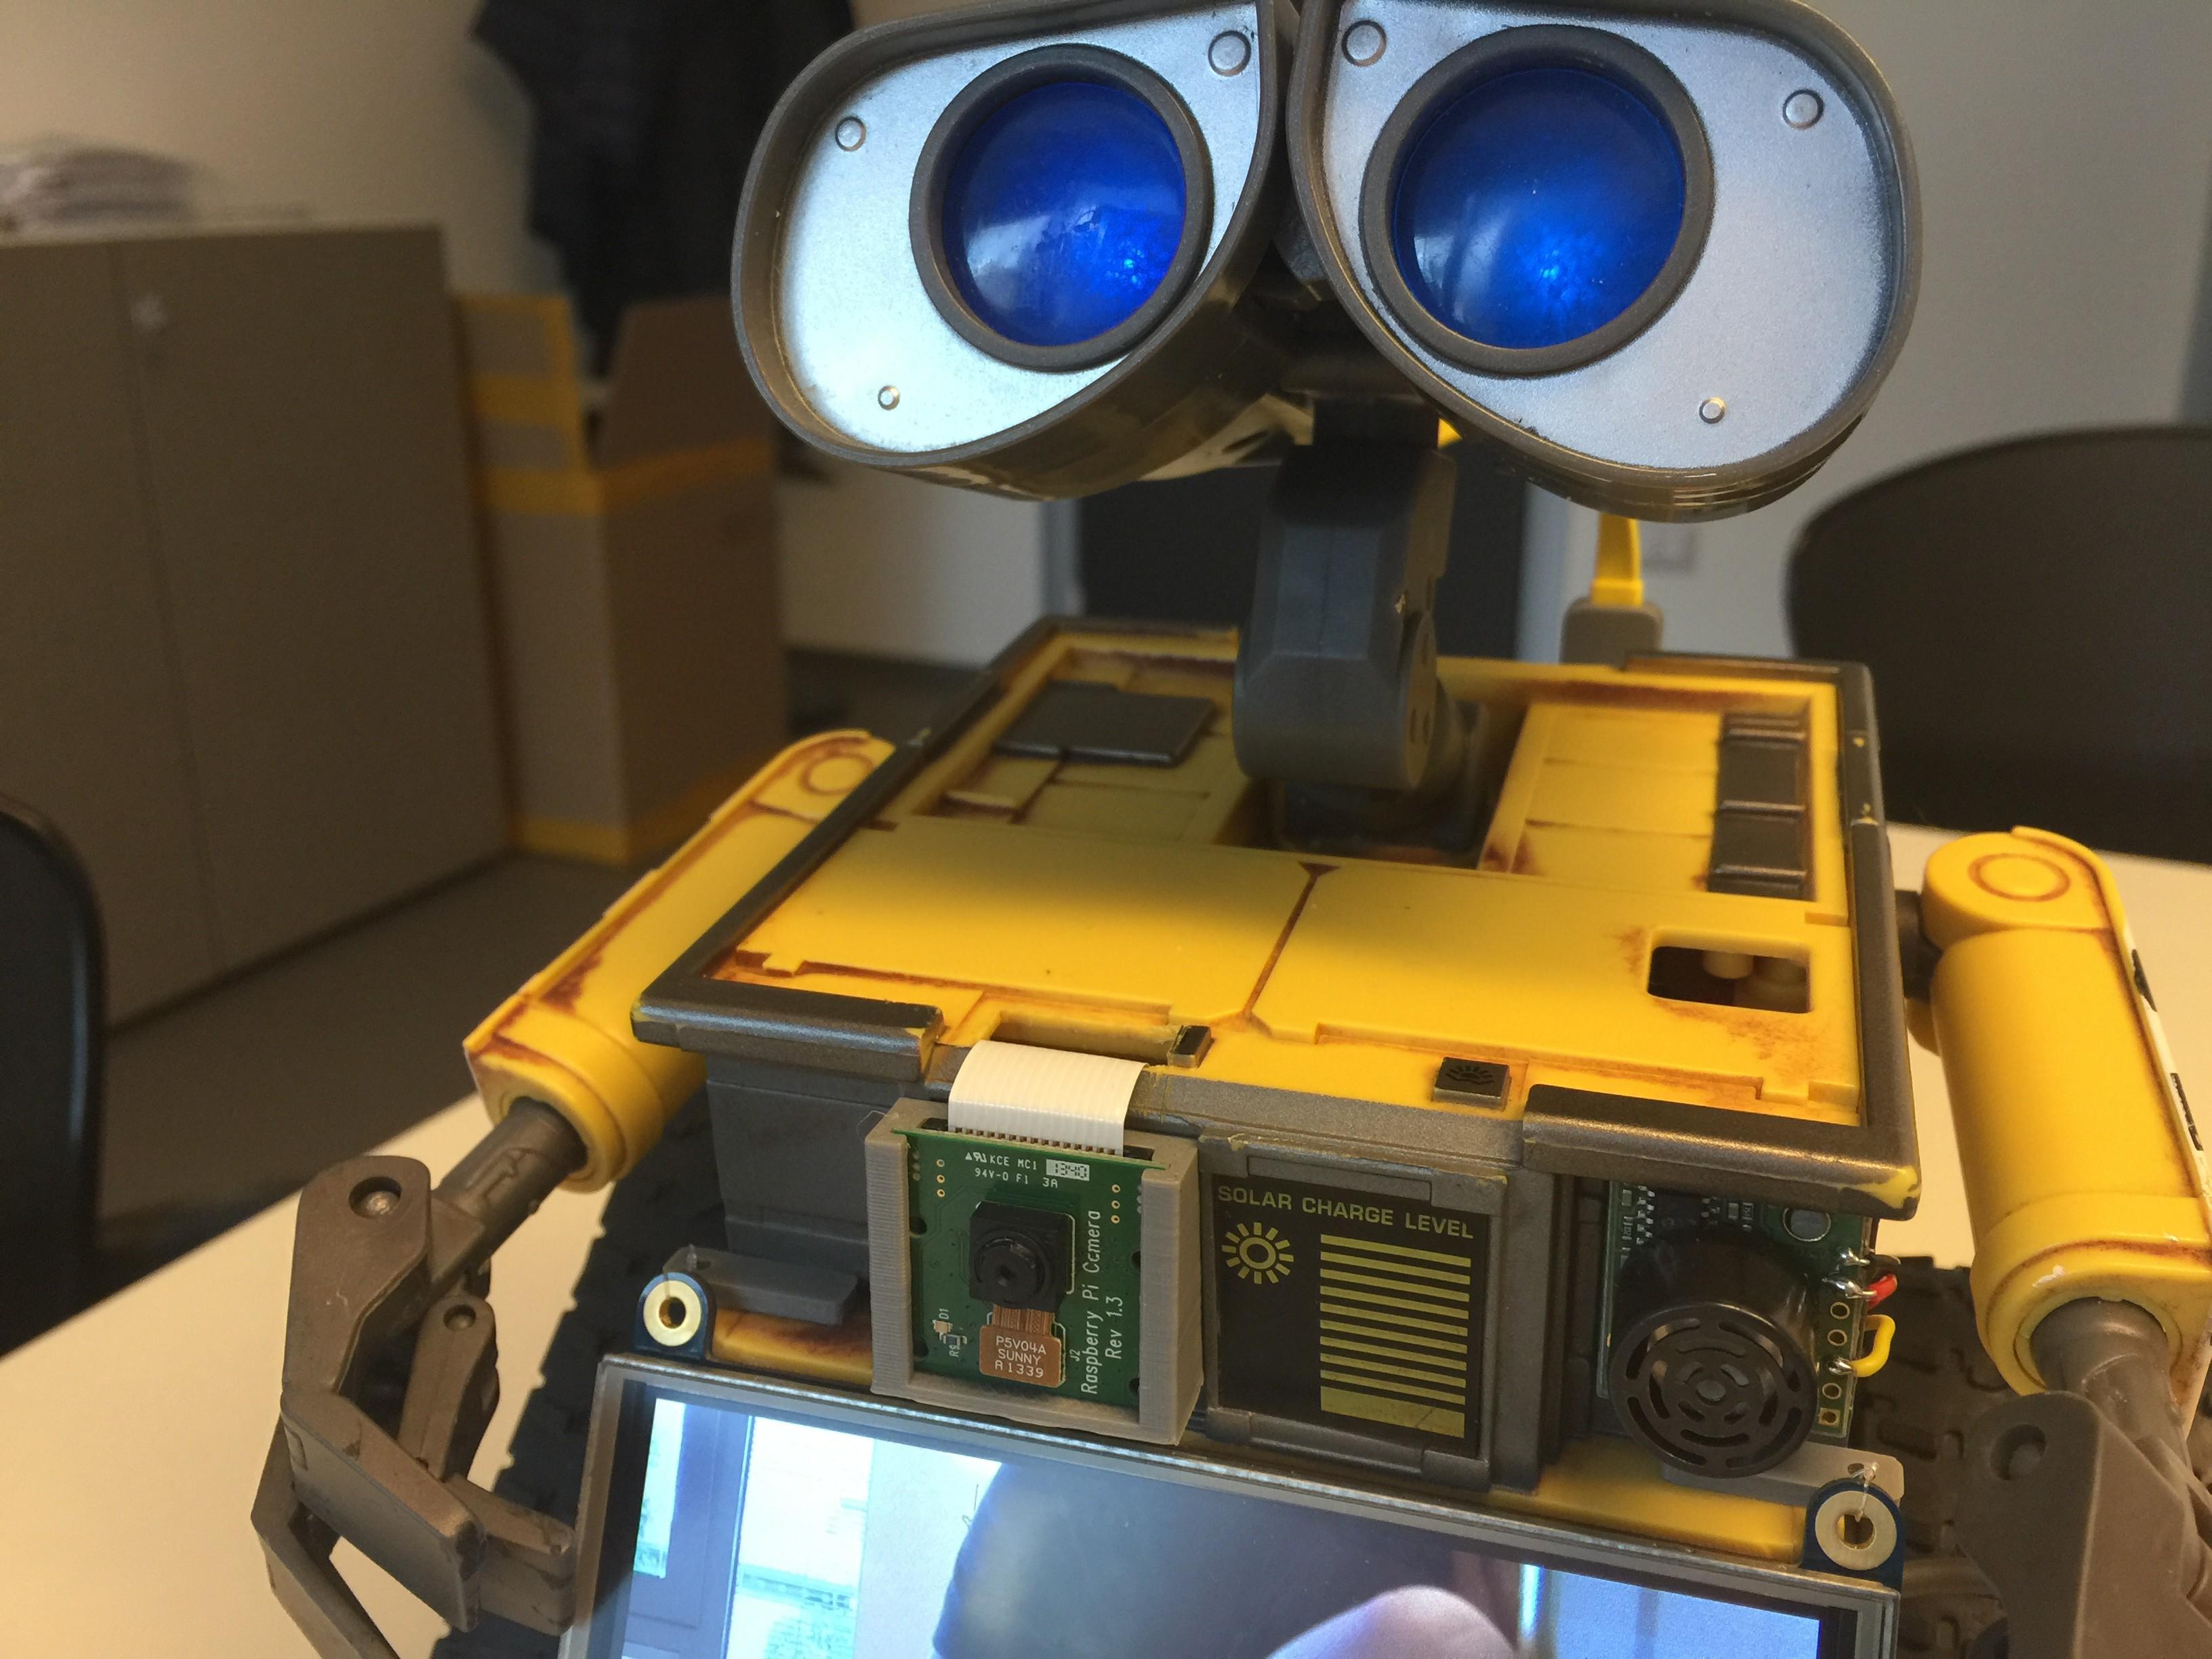 Terminator Wall-e Raspberry/OpenCM9 04/Dynamixel | Hackaday io